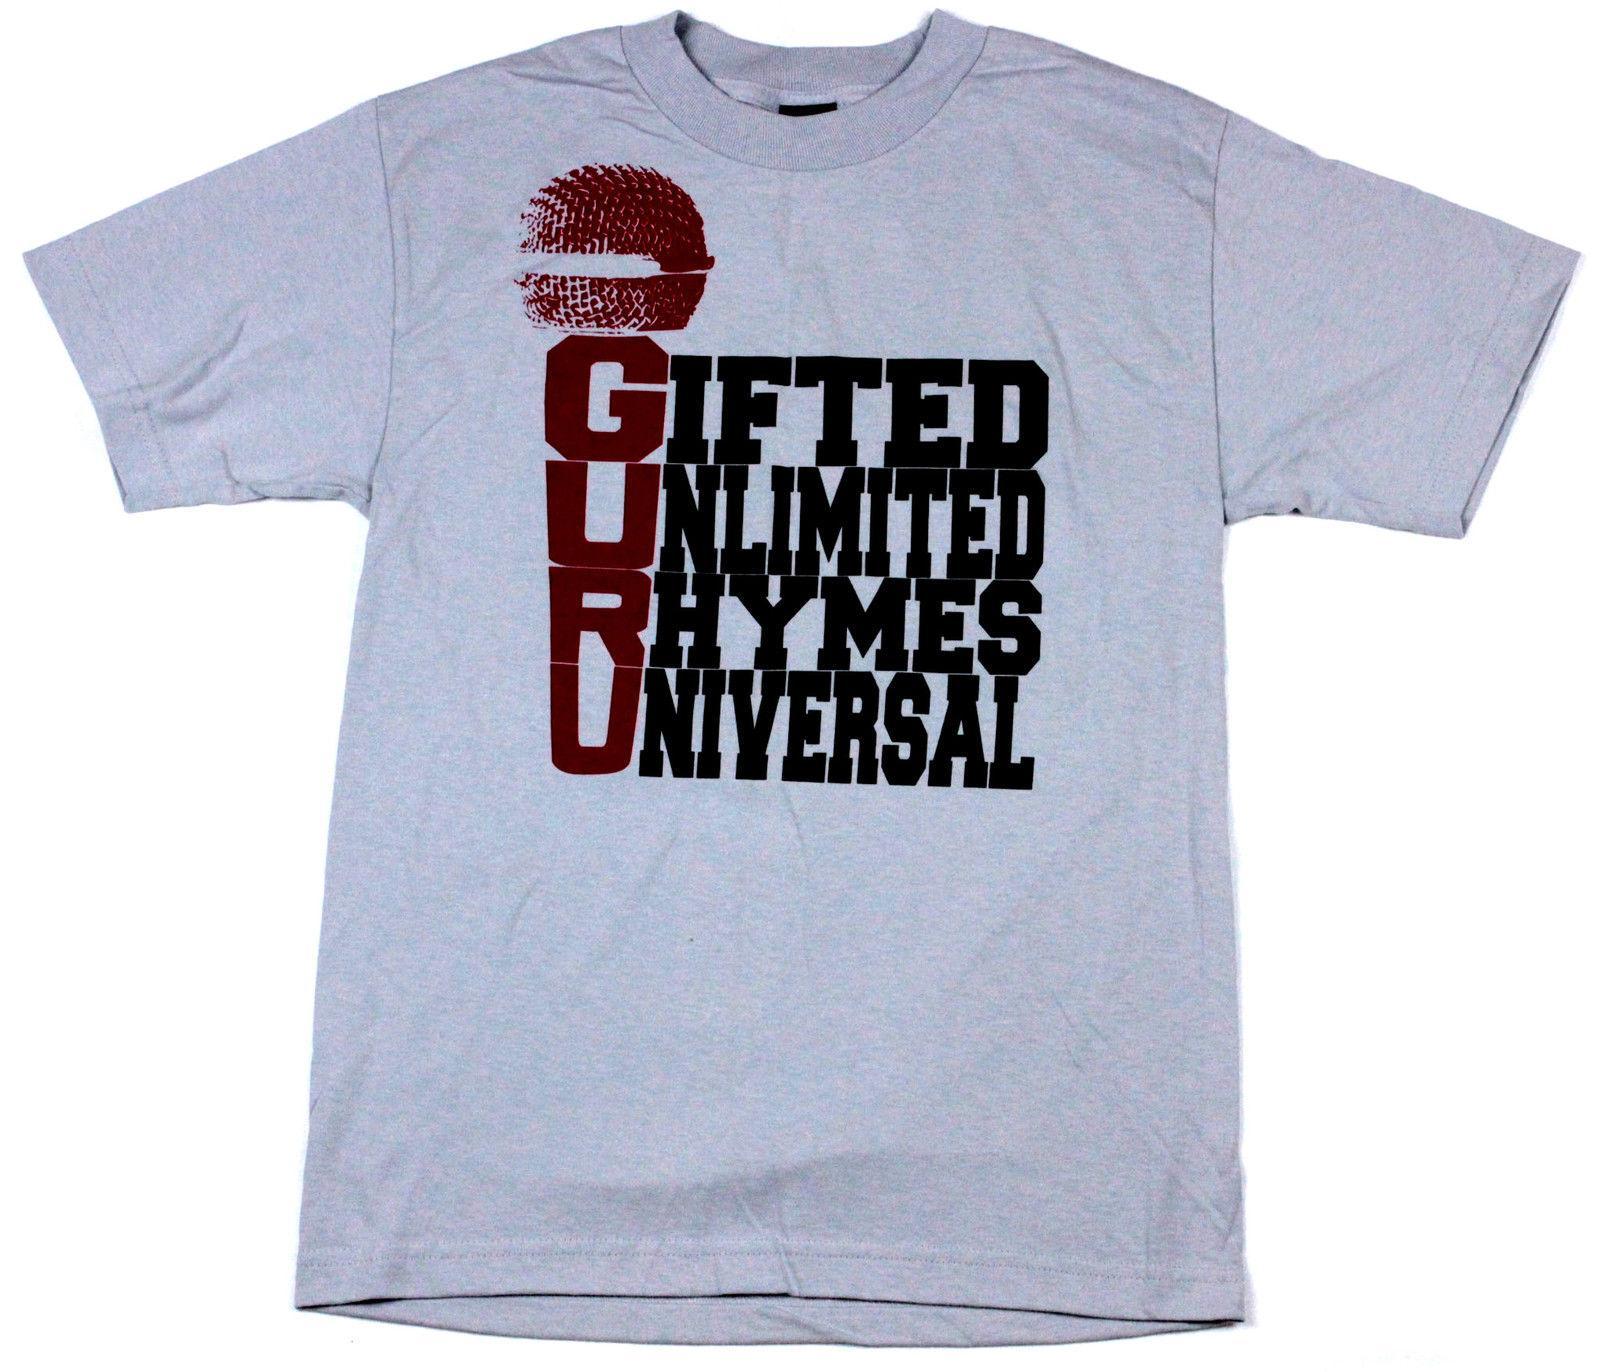 Mixerfriendly Guru silver t-shirt -BNWT- Gang Starr DJ Premier real Hip-Hop